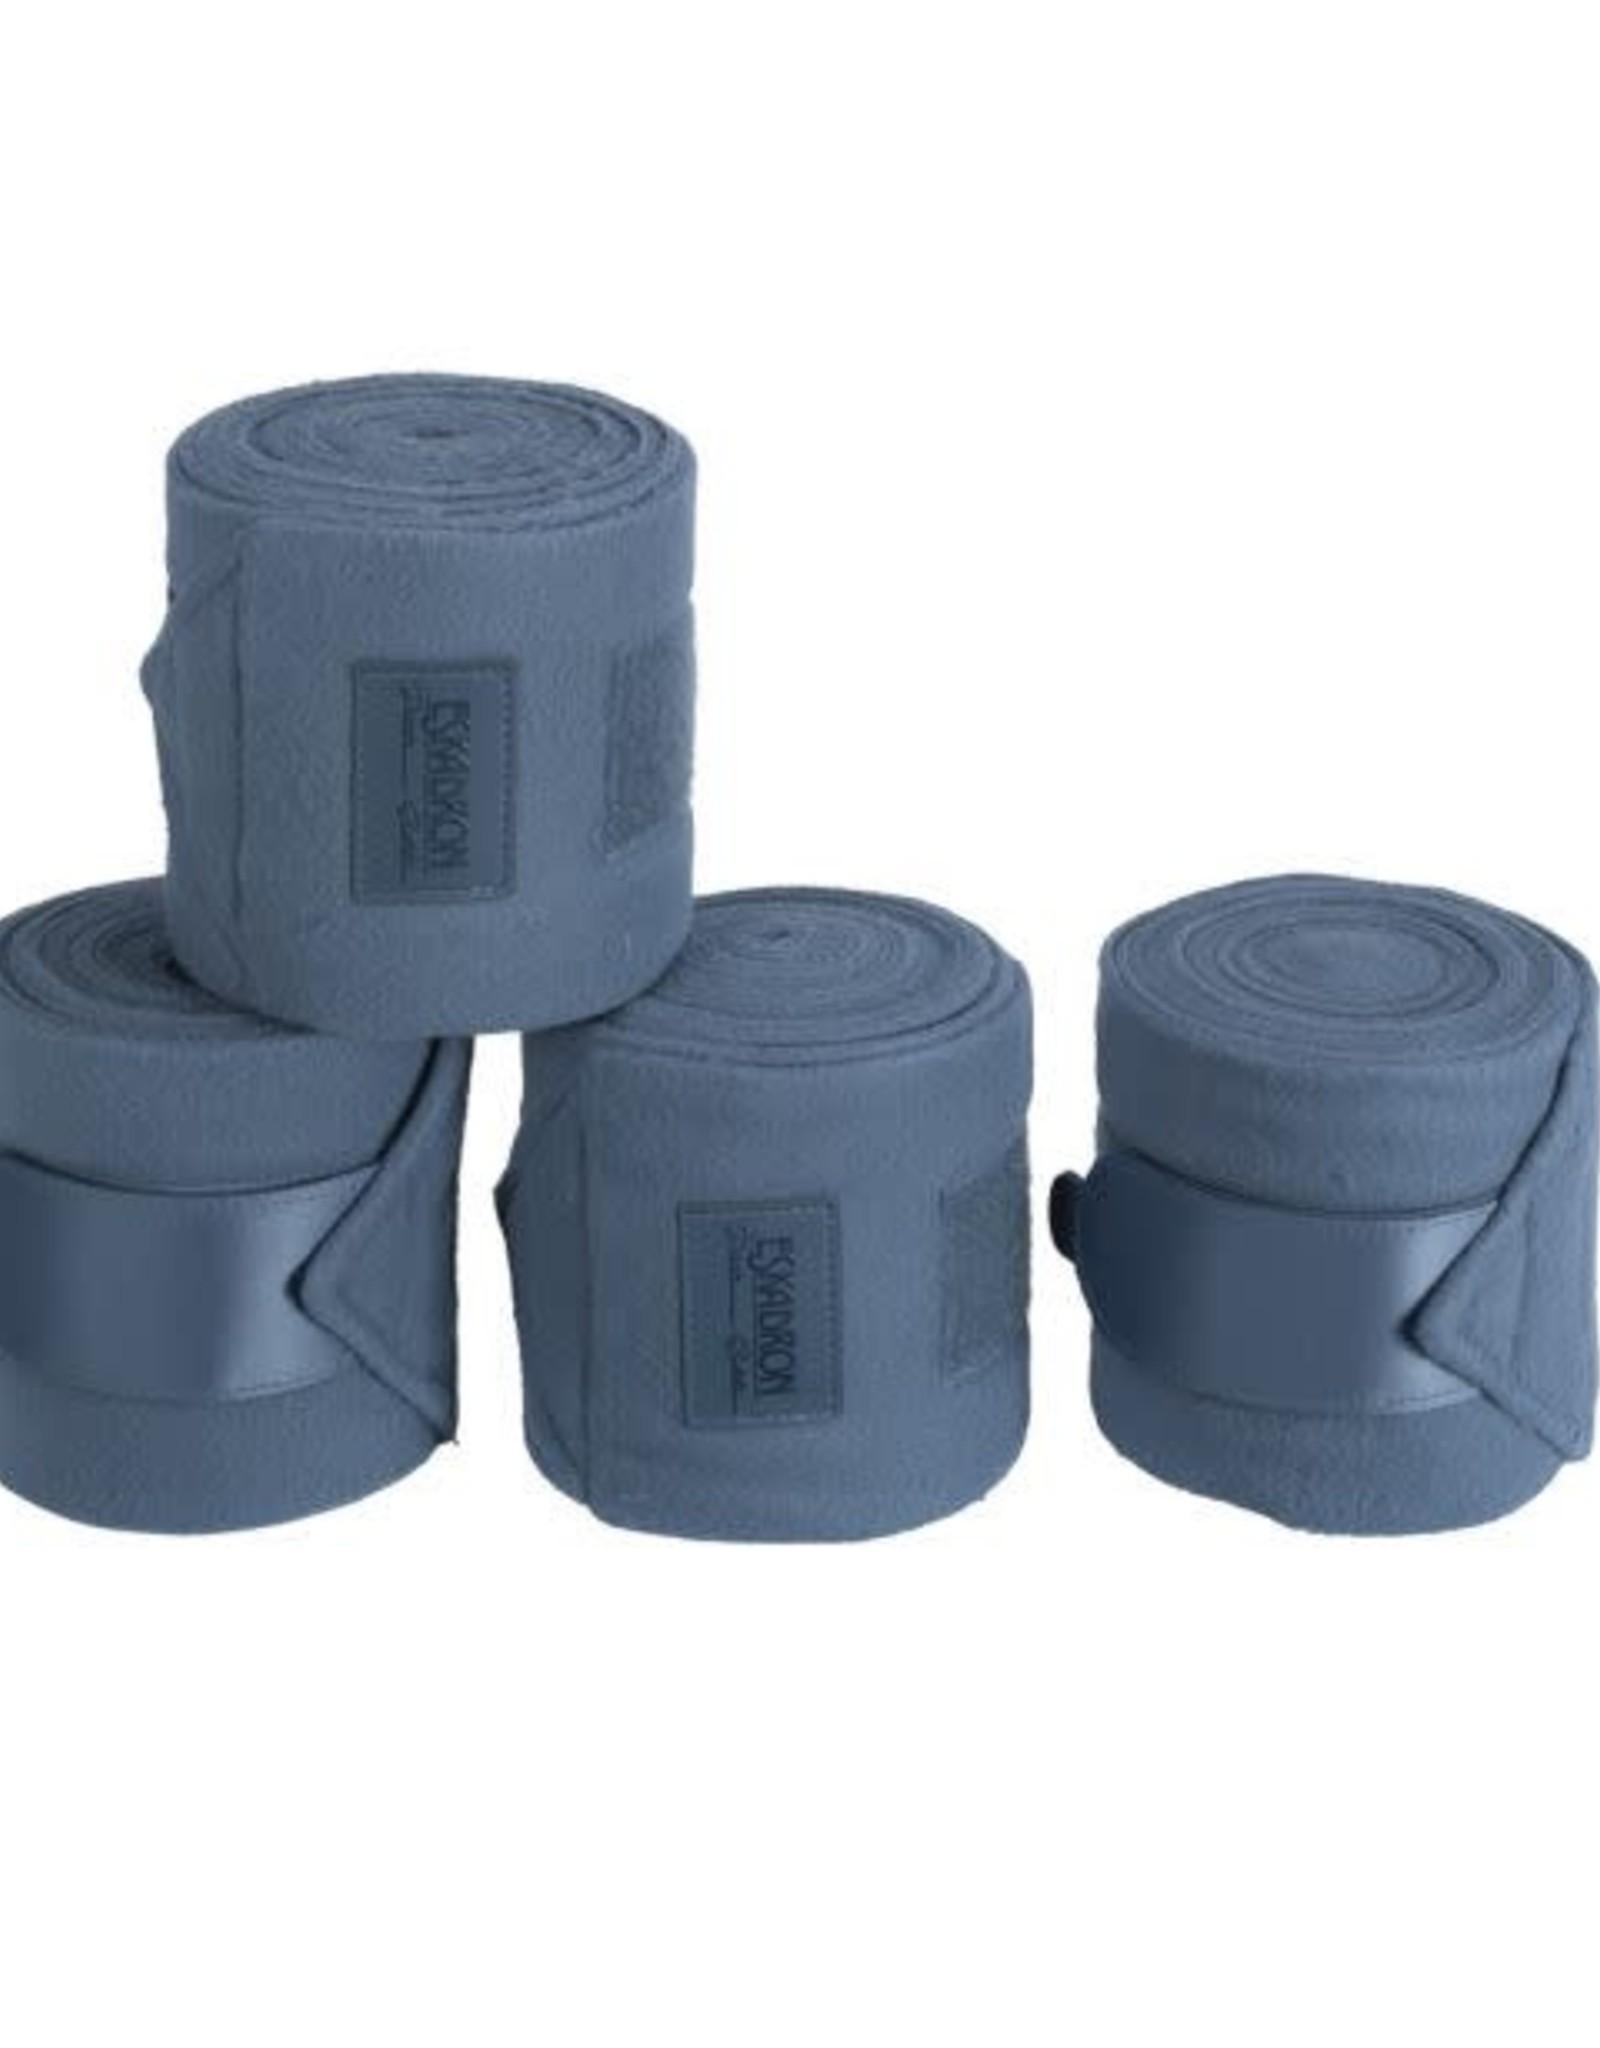 Eskadron Eskadron Bandages Platinum Blauw